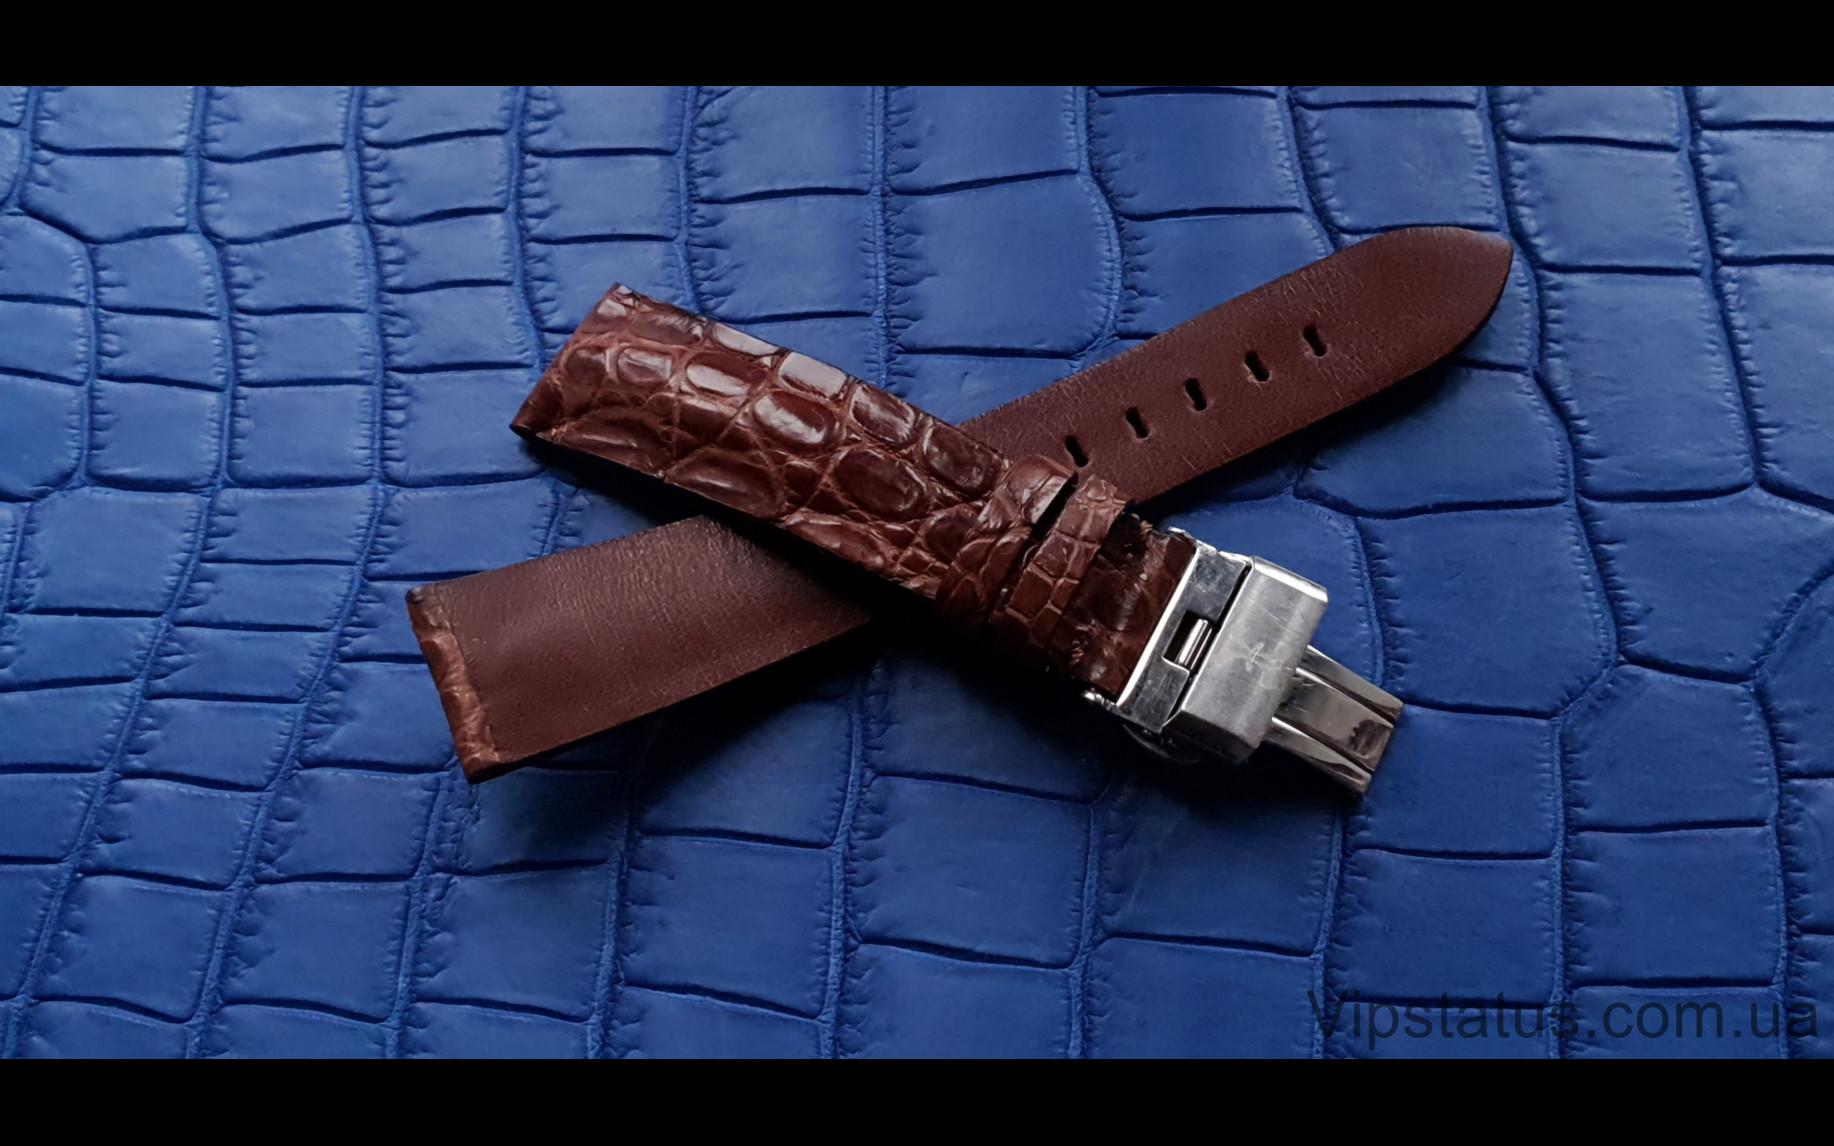 Elite Вип ремешок для часов Bernhard H. Mayer кожа крокодила Vip Crocodile Strap for Bernhard H. Mayer watches image 3